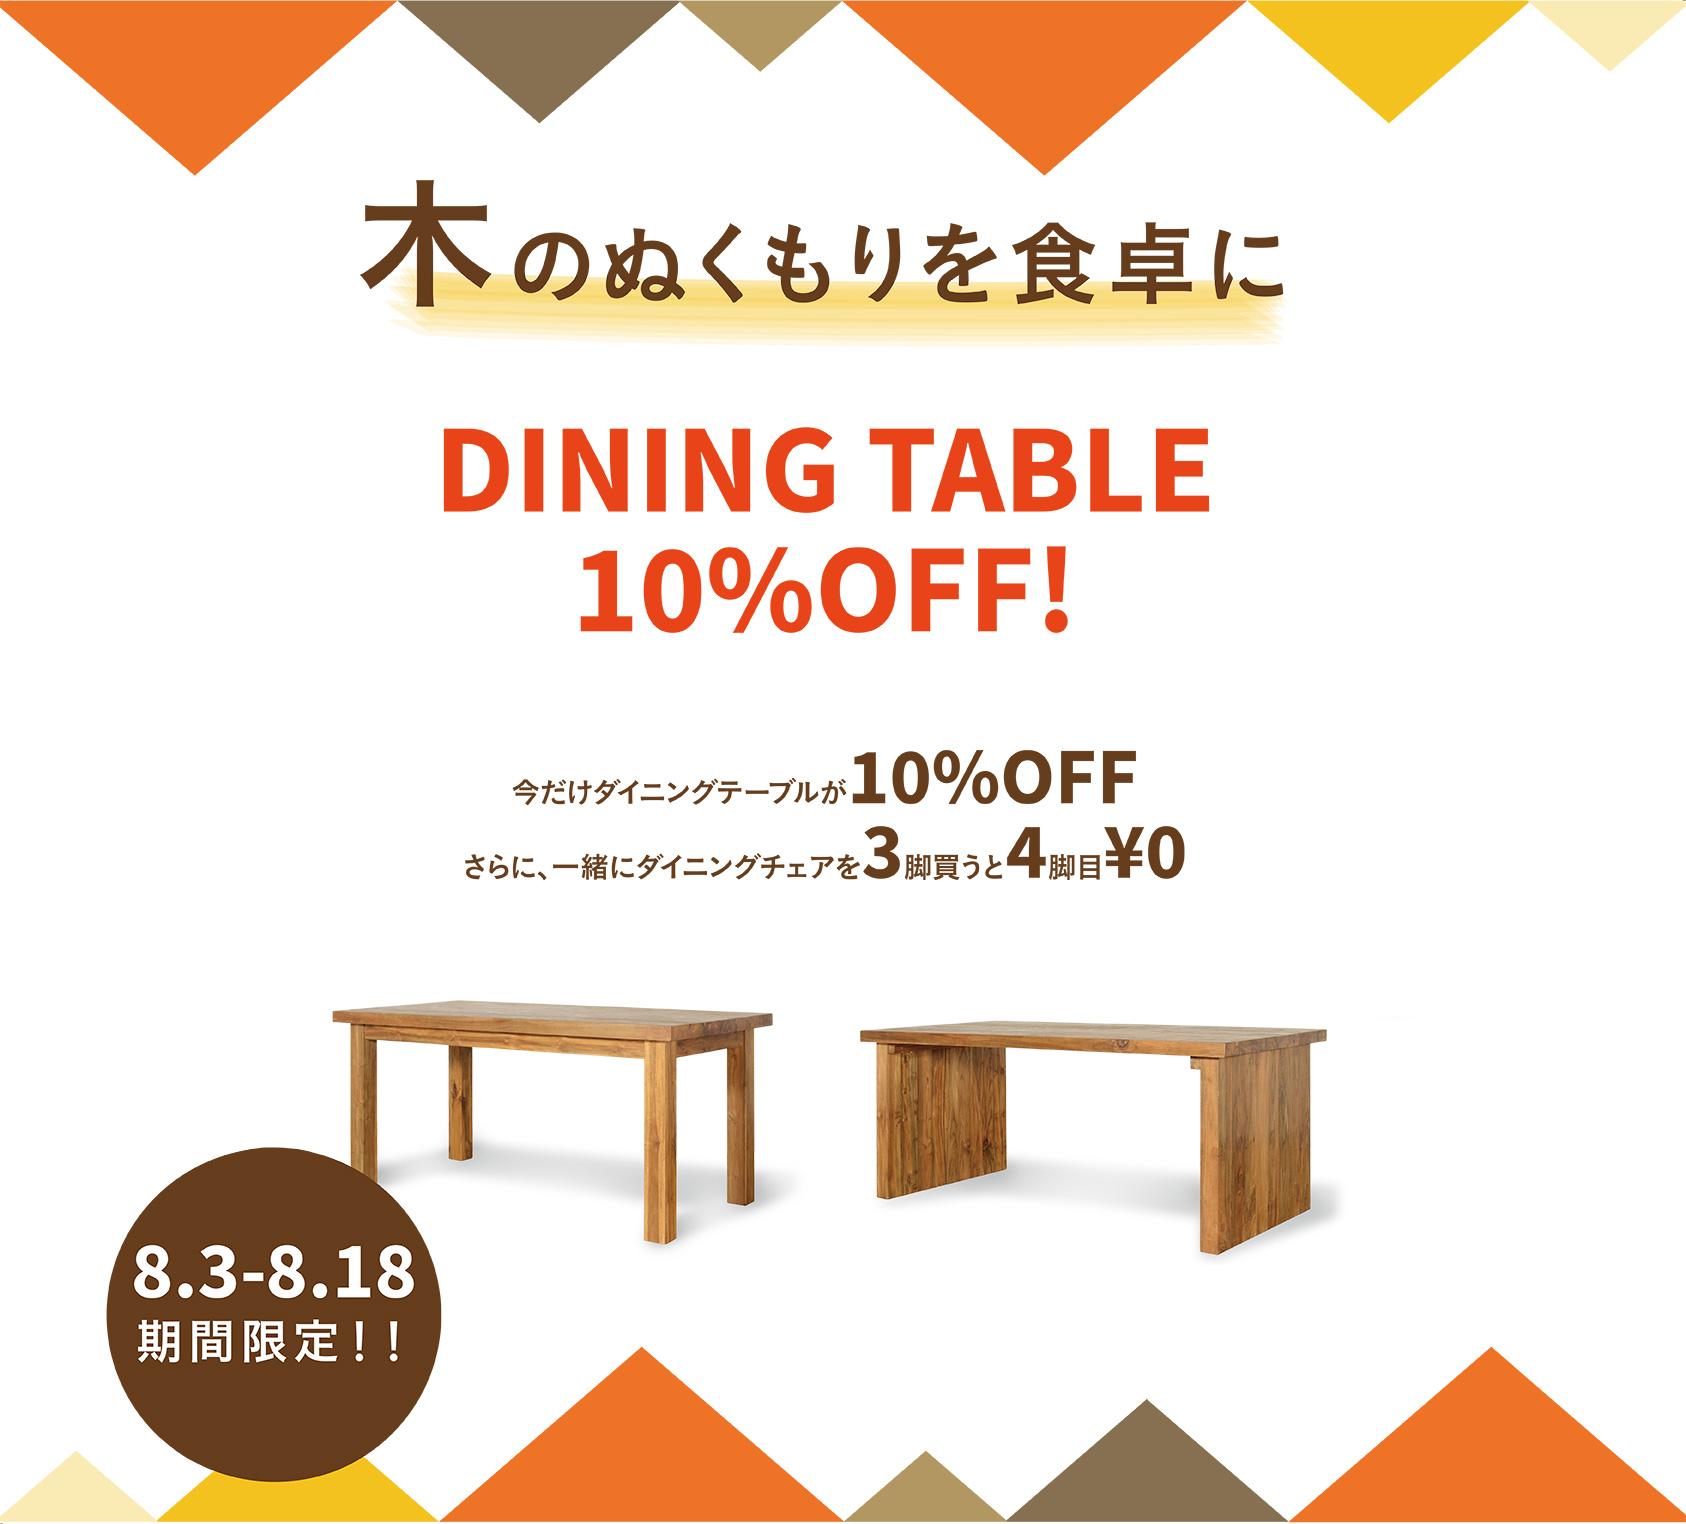 KAJAダイニングテーブル10%OFF